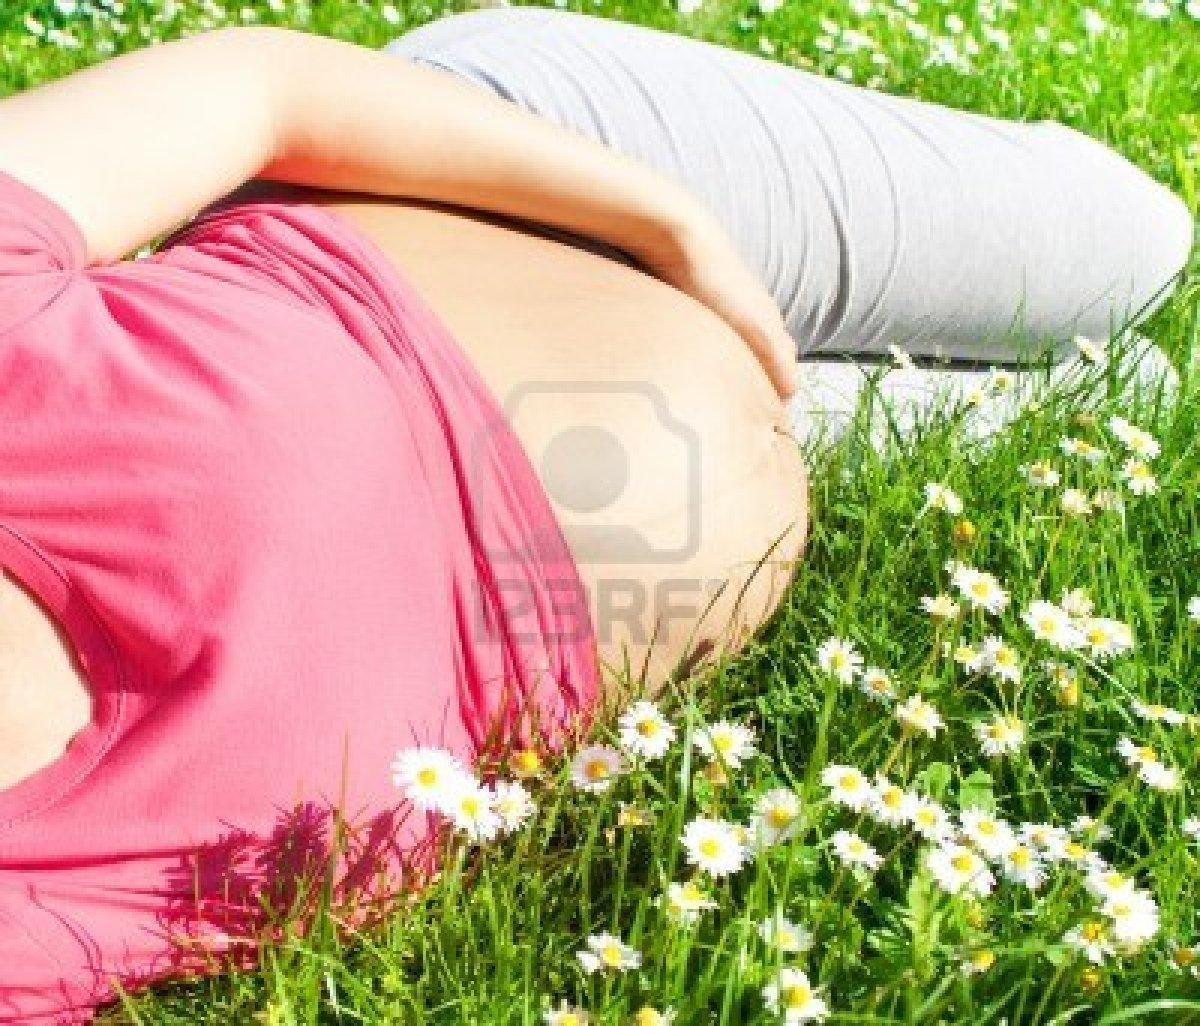 Dicas Para Se Proteger Do Sol Durante A Gravidez